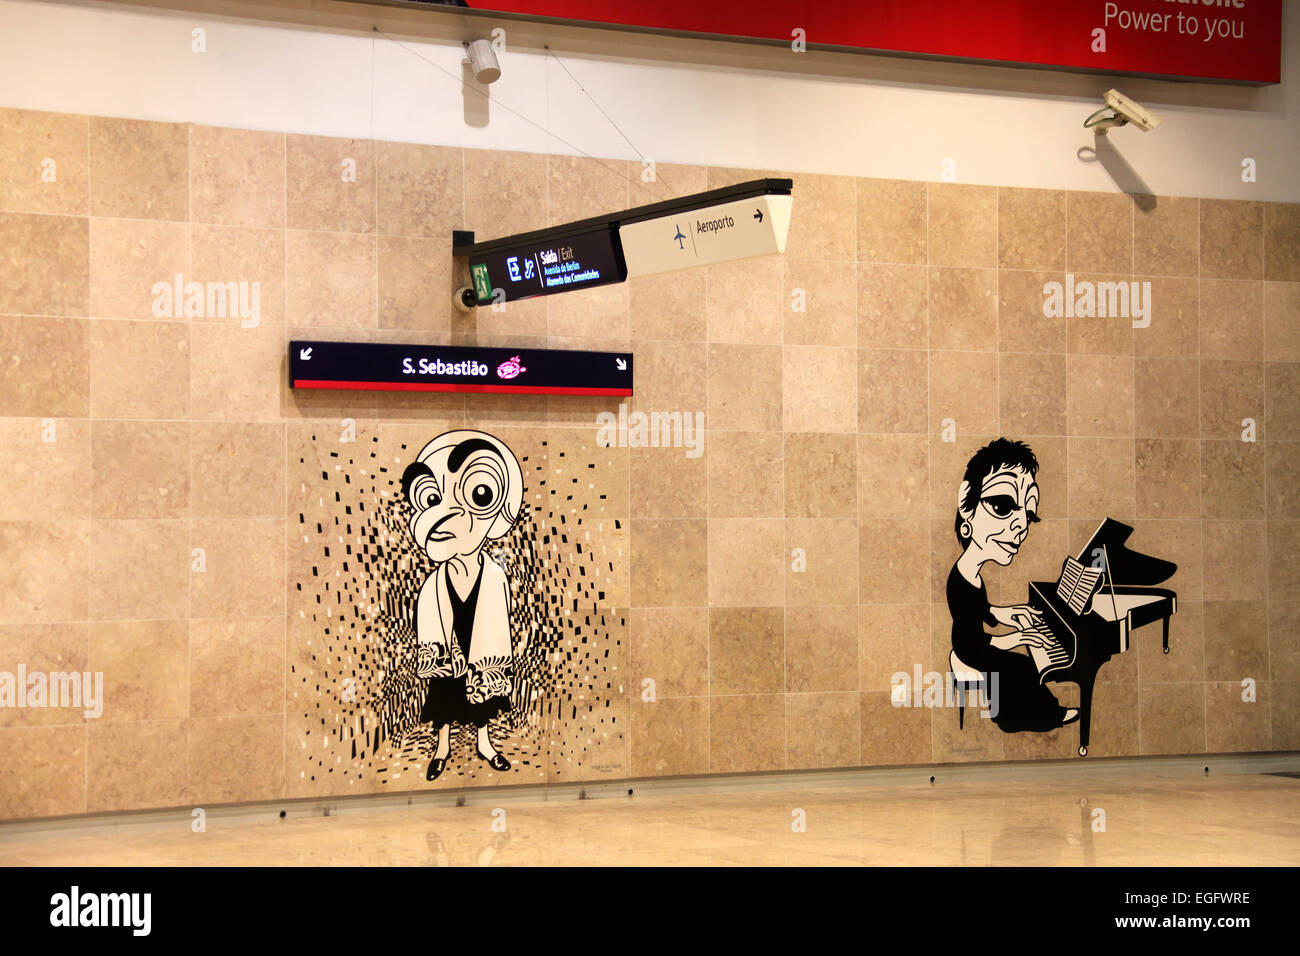 Artwork in the Lisbon Subway Stock Photo: 79025506 - Alamy